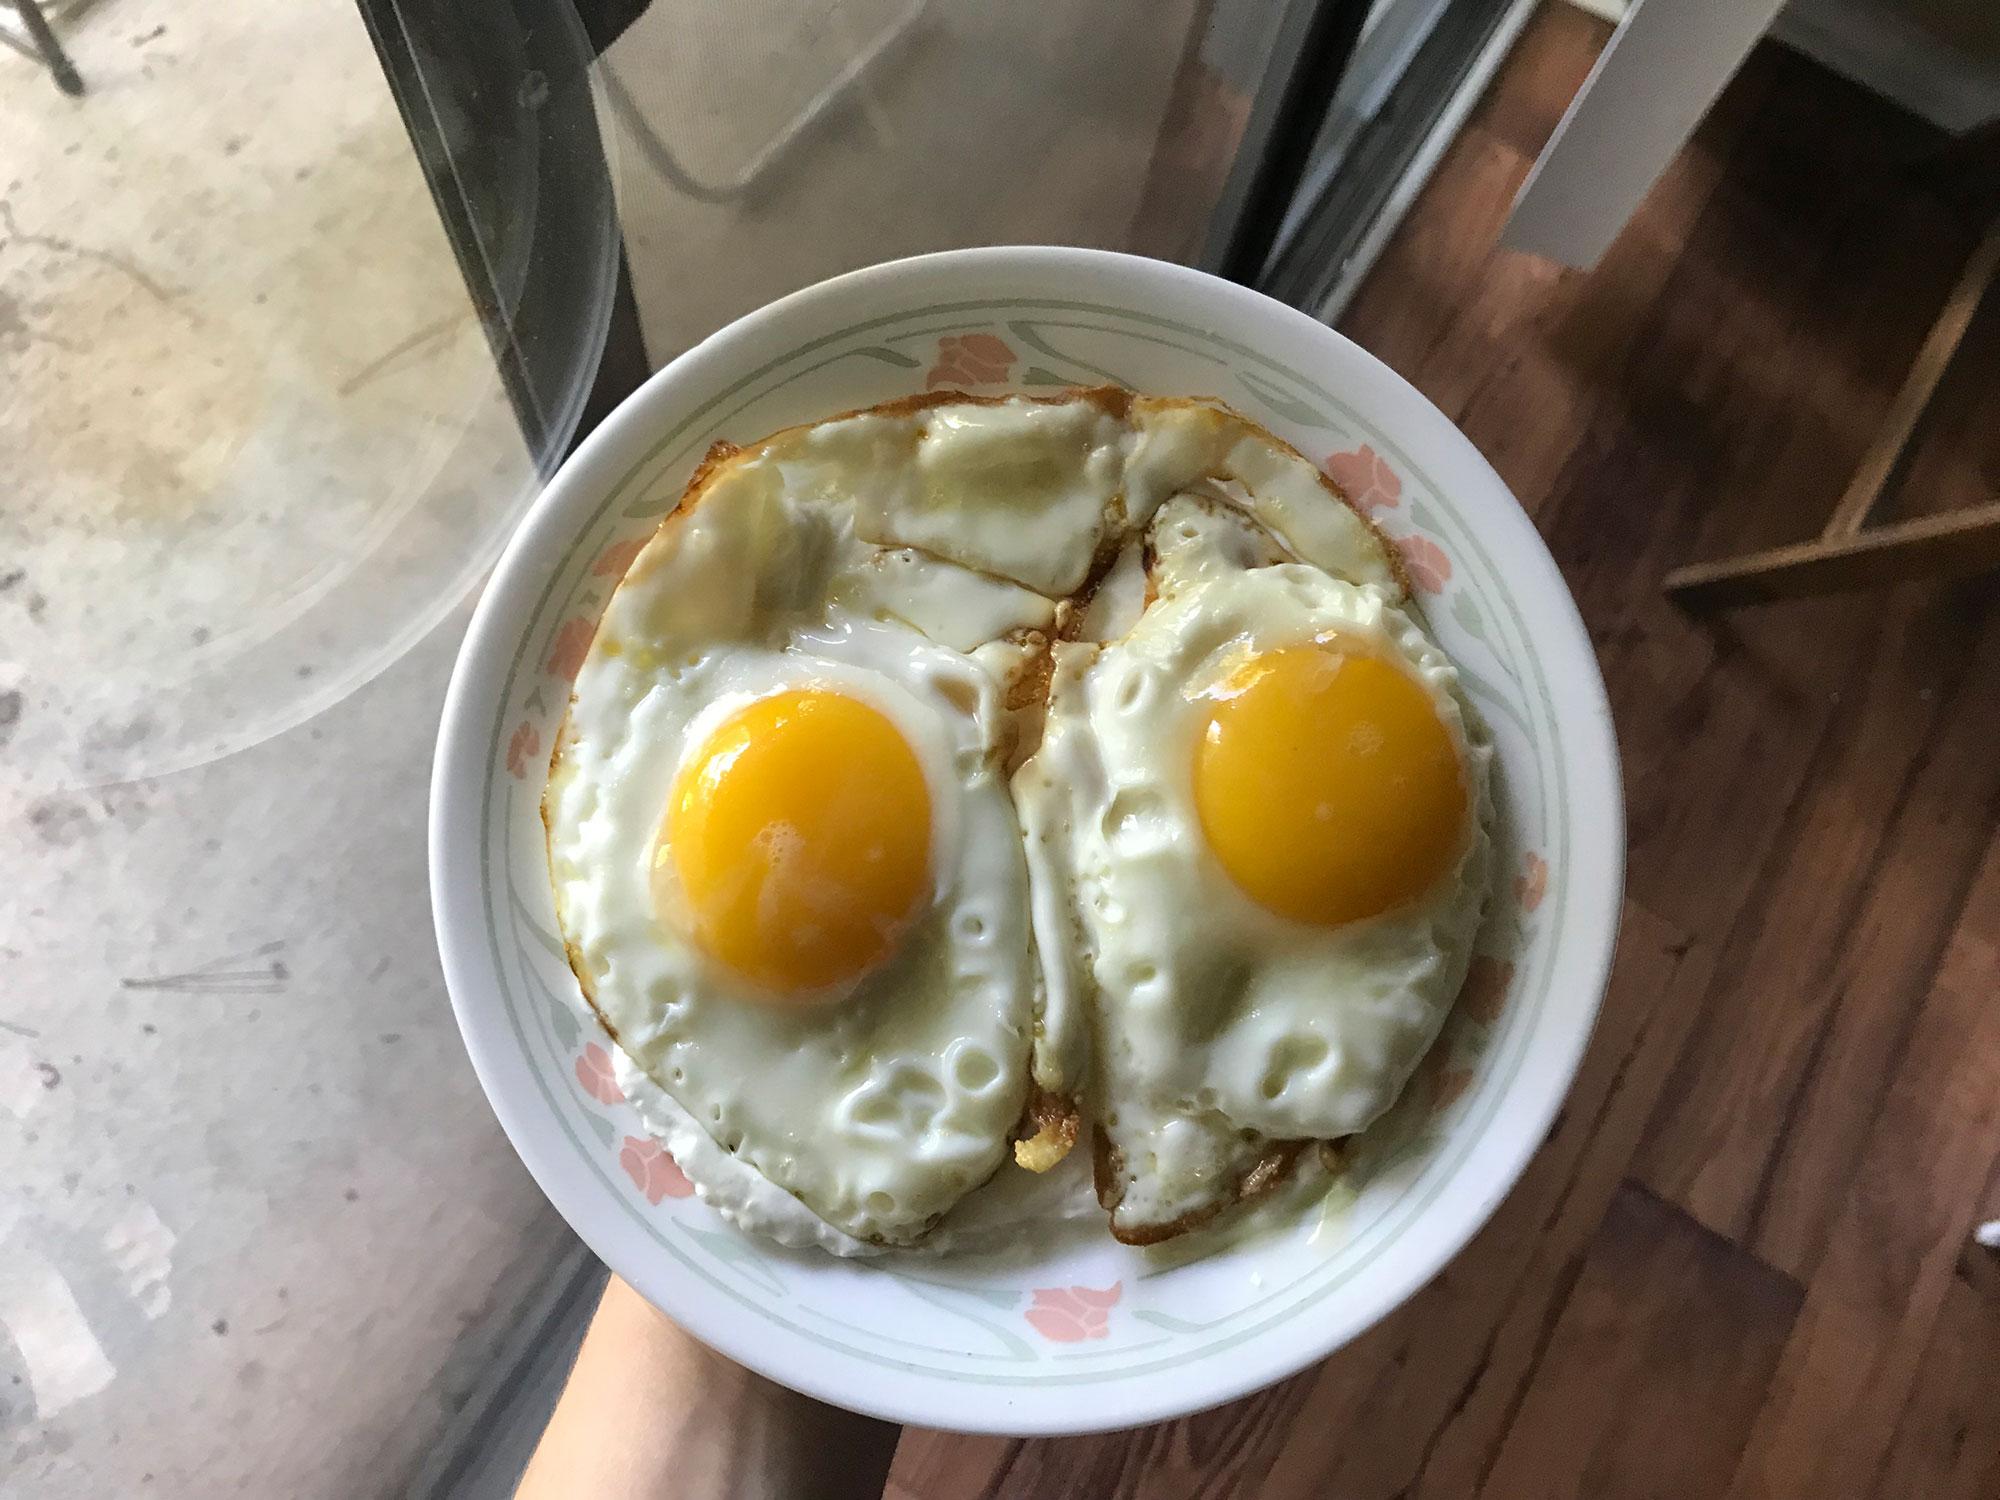 Eggs and Yogurt